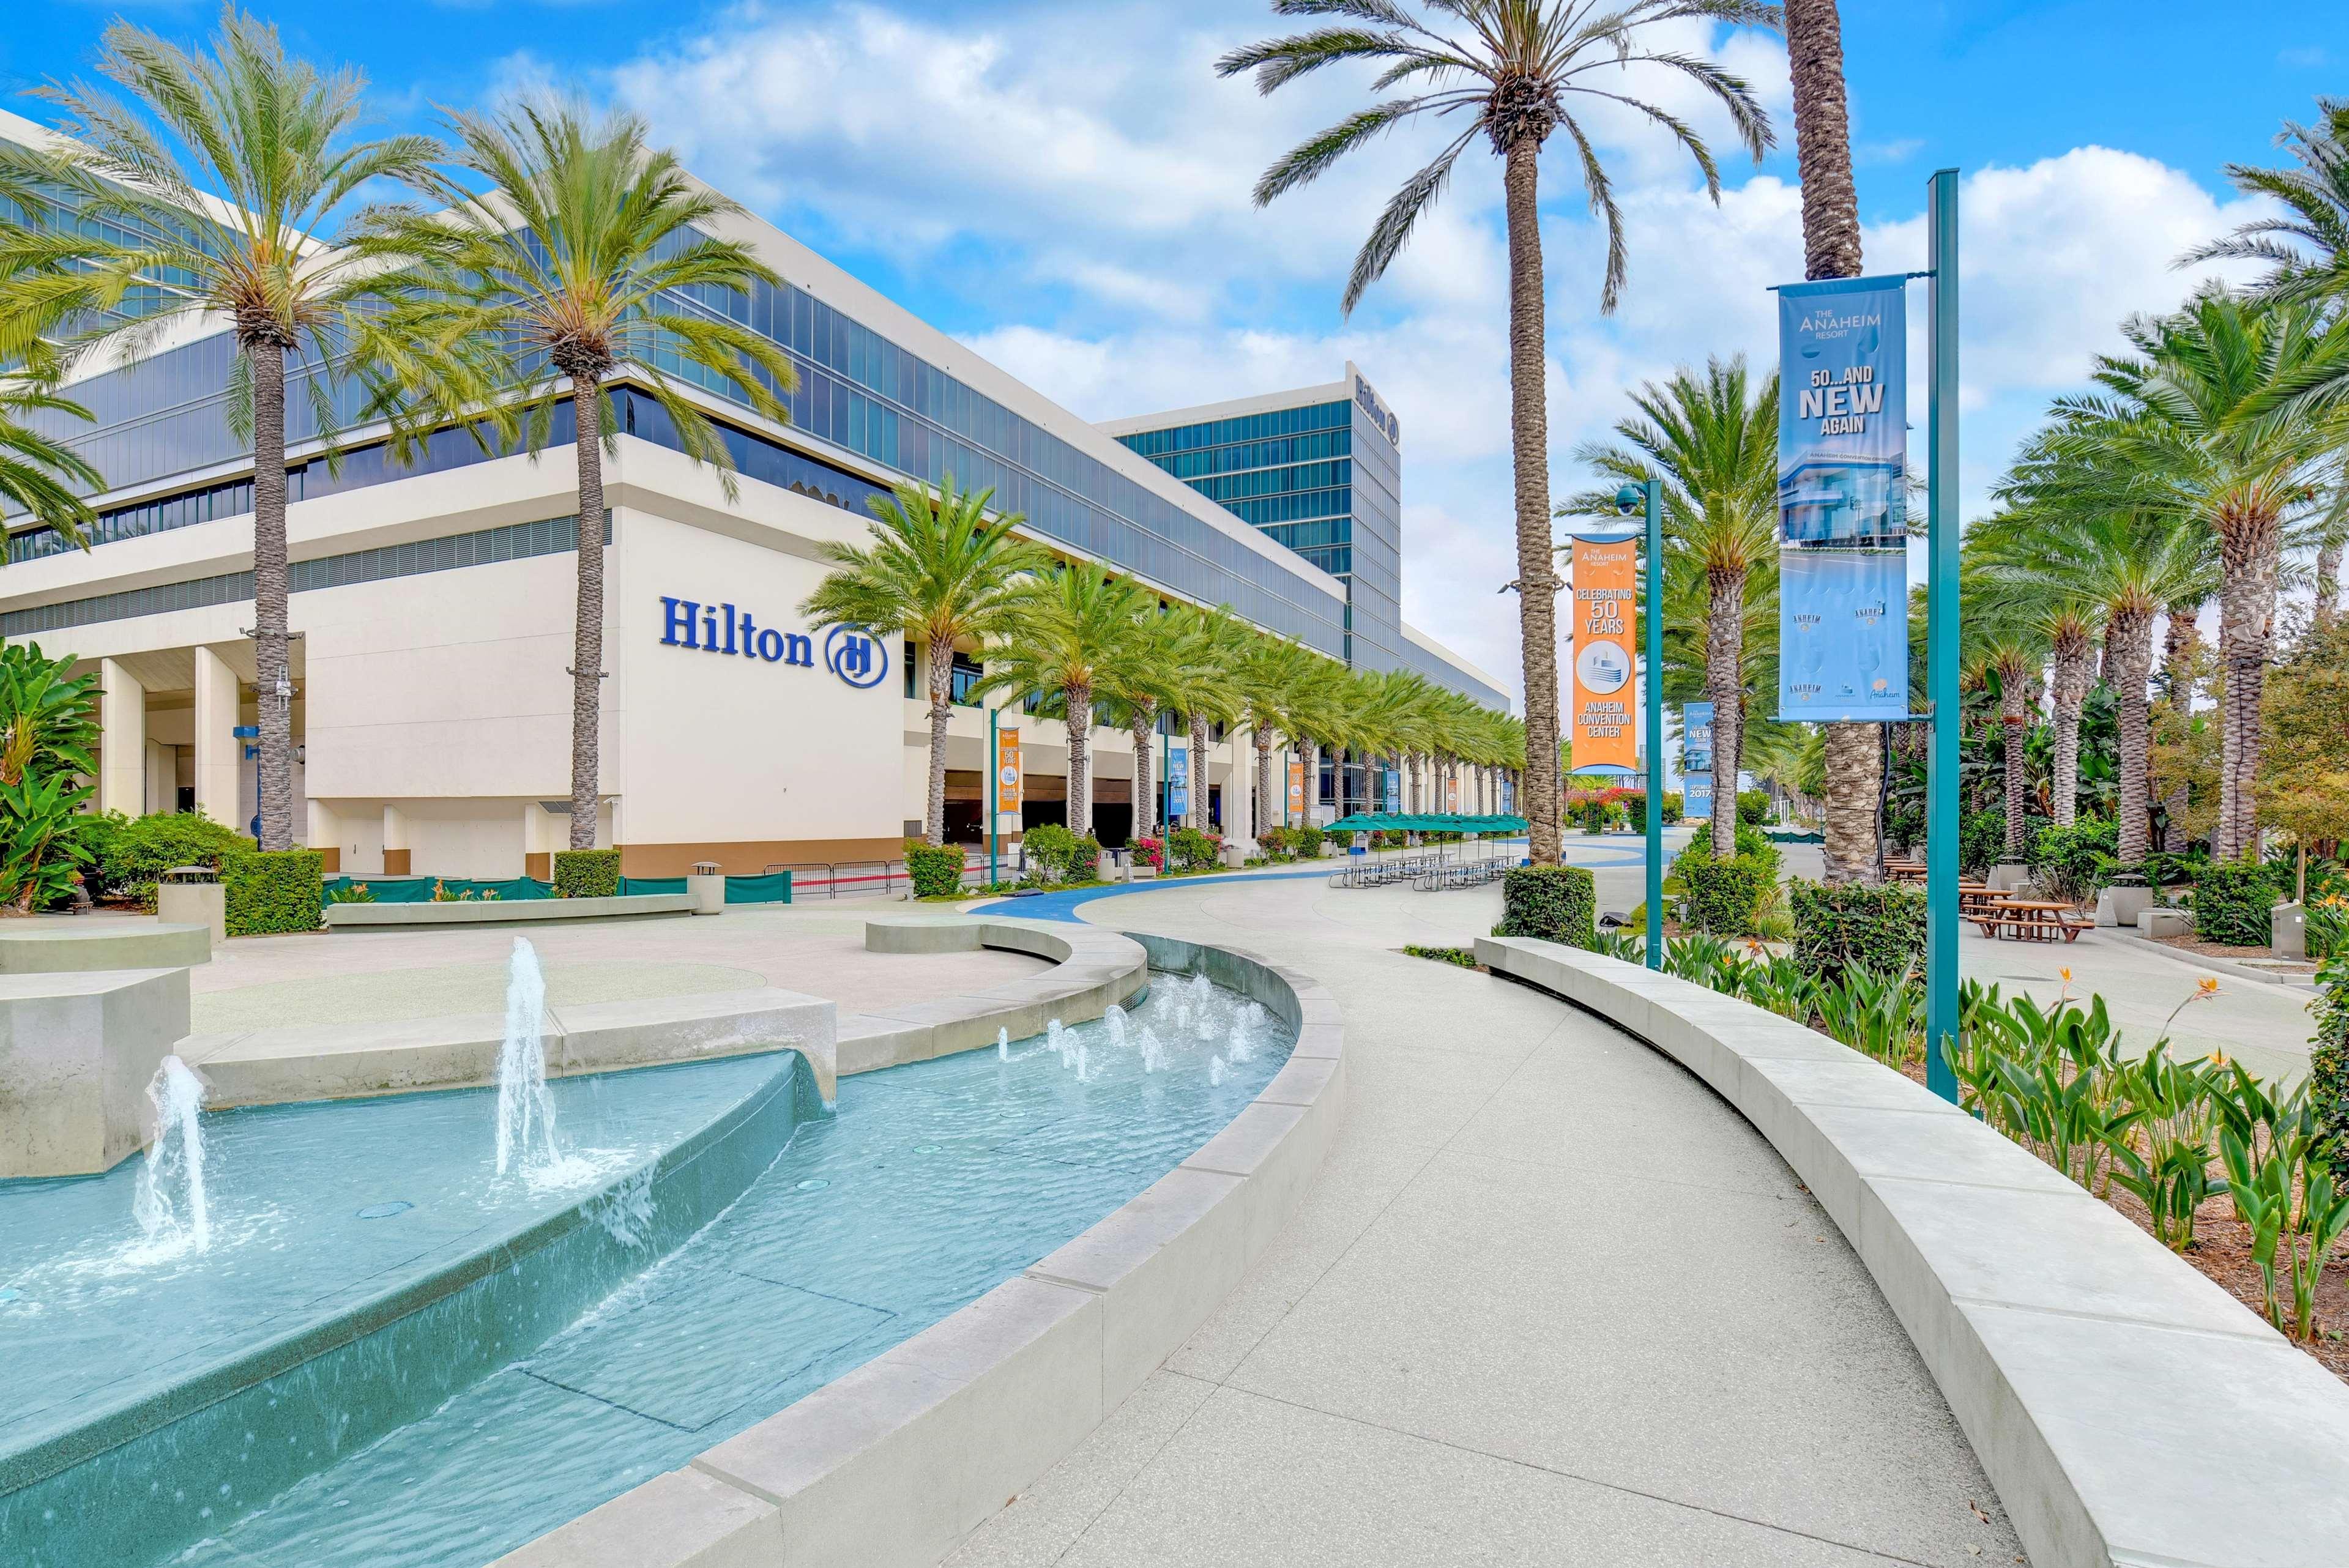 Hilton Anaheim 777 W Convention Way